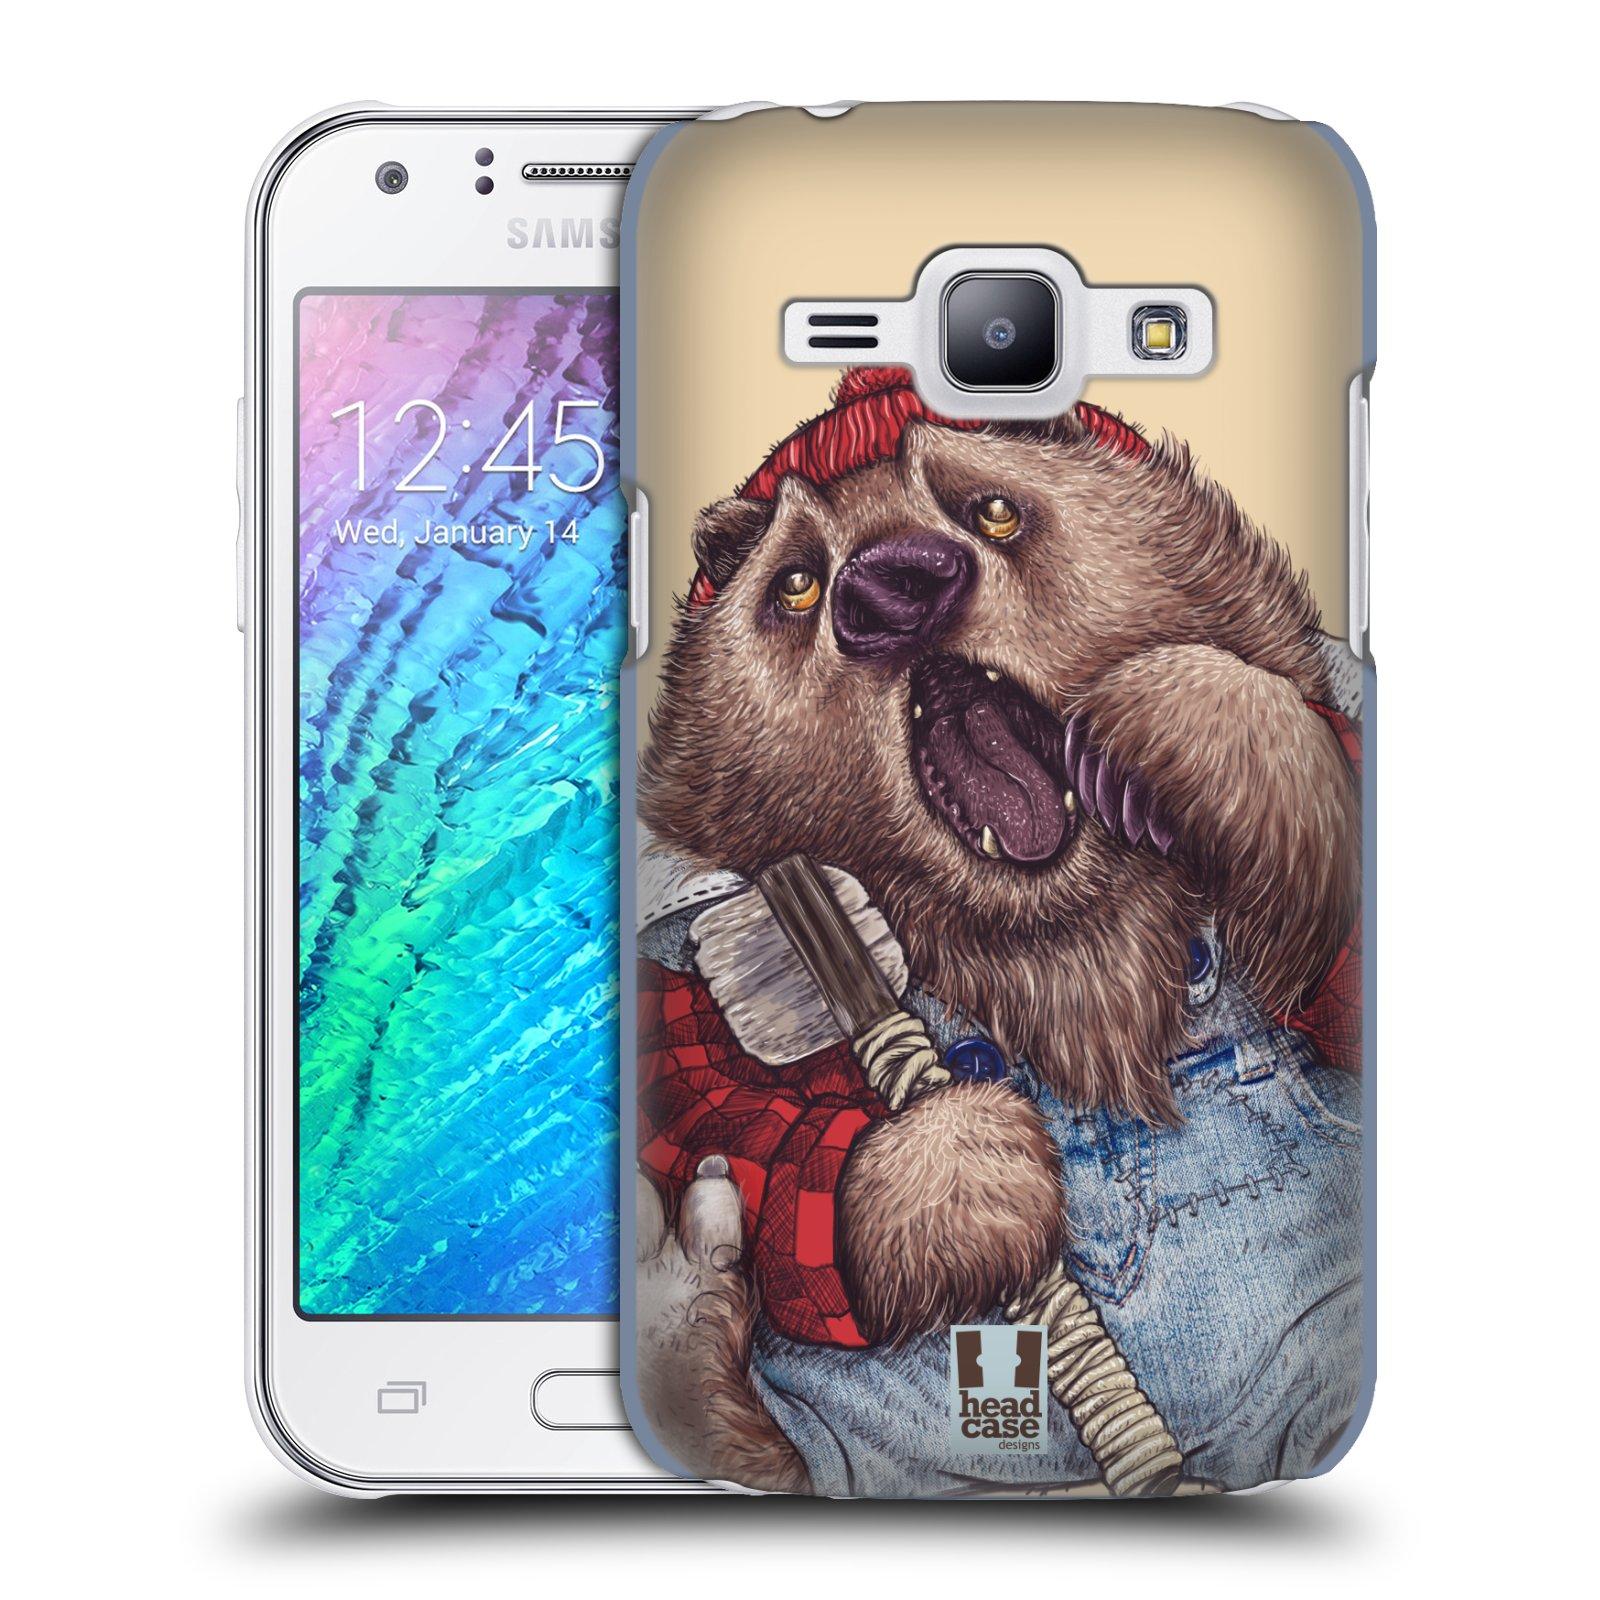 HEAD CASE plastový obal na mobil SAMSUNG Galaxy J1, J100 vzor Kreslená zvířátka medvěd